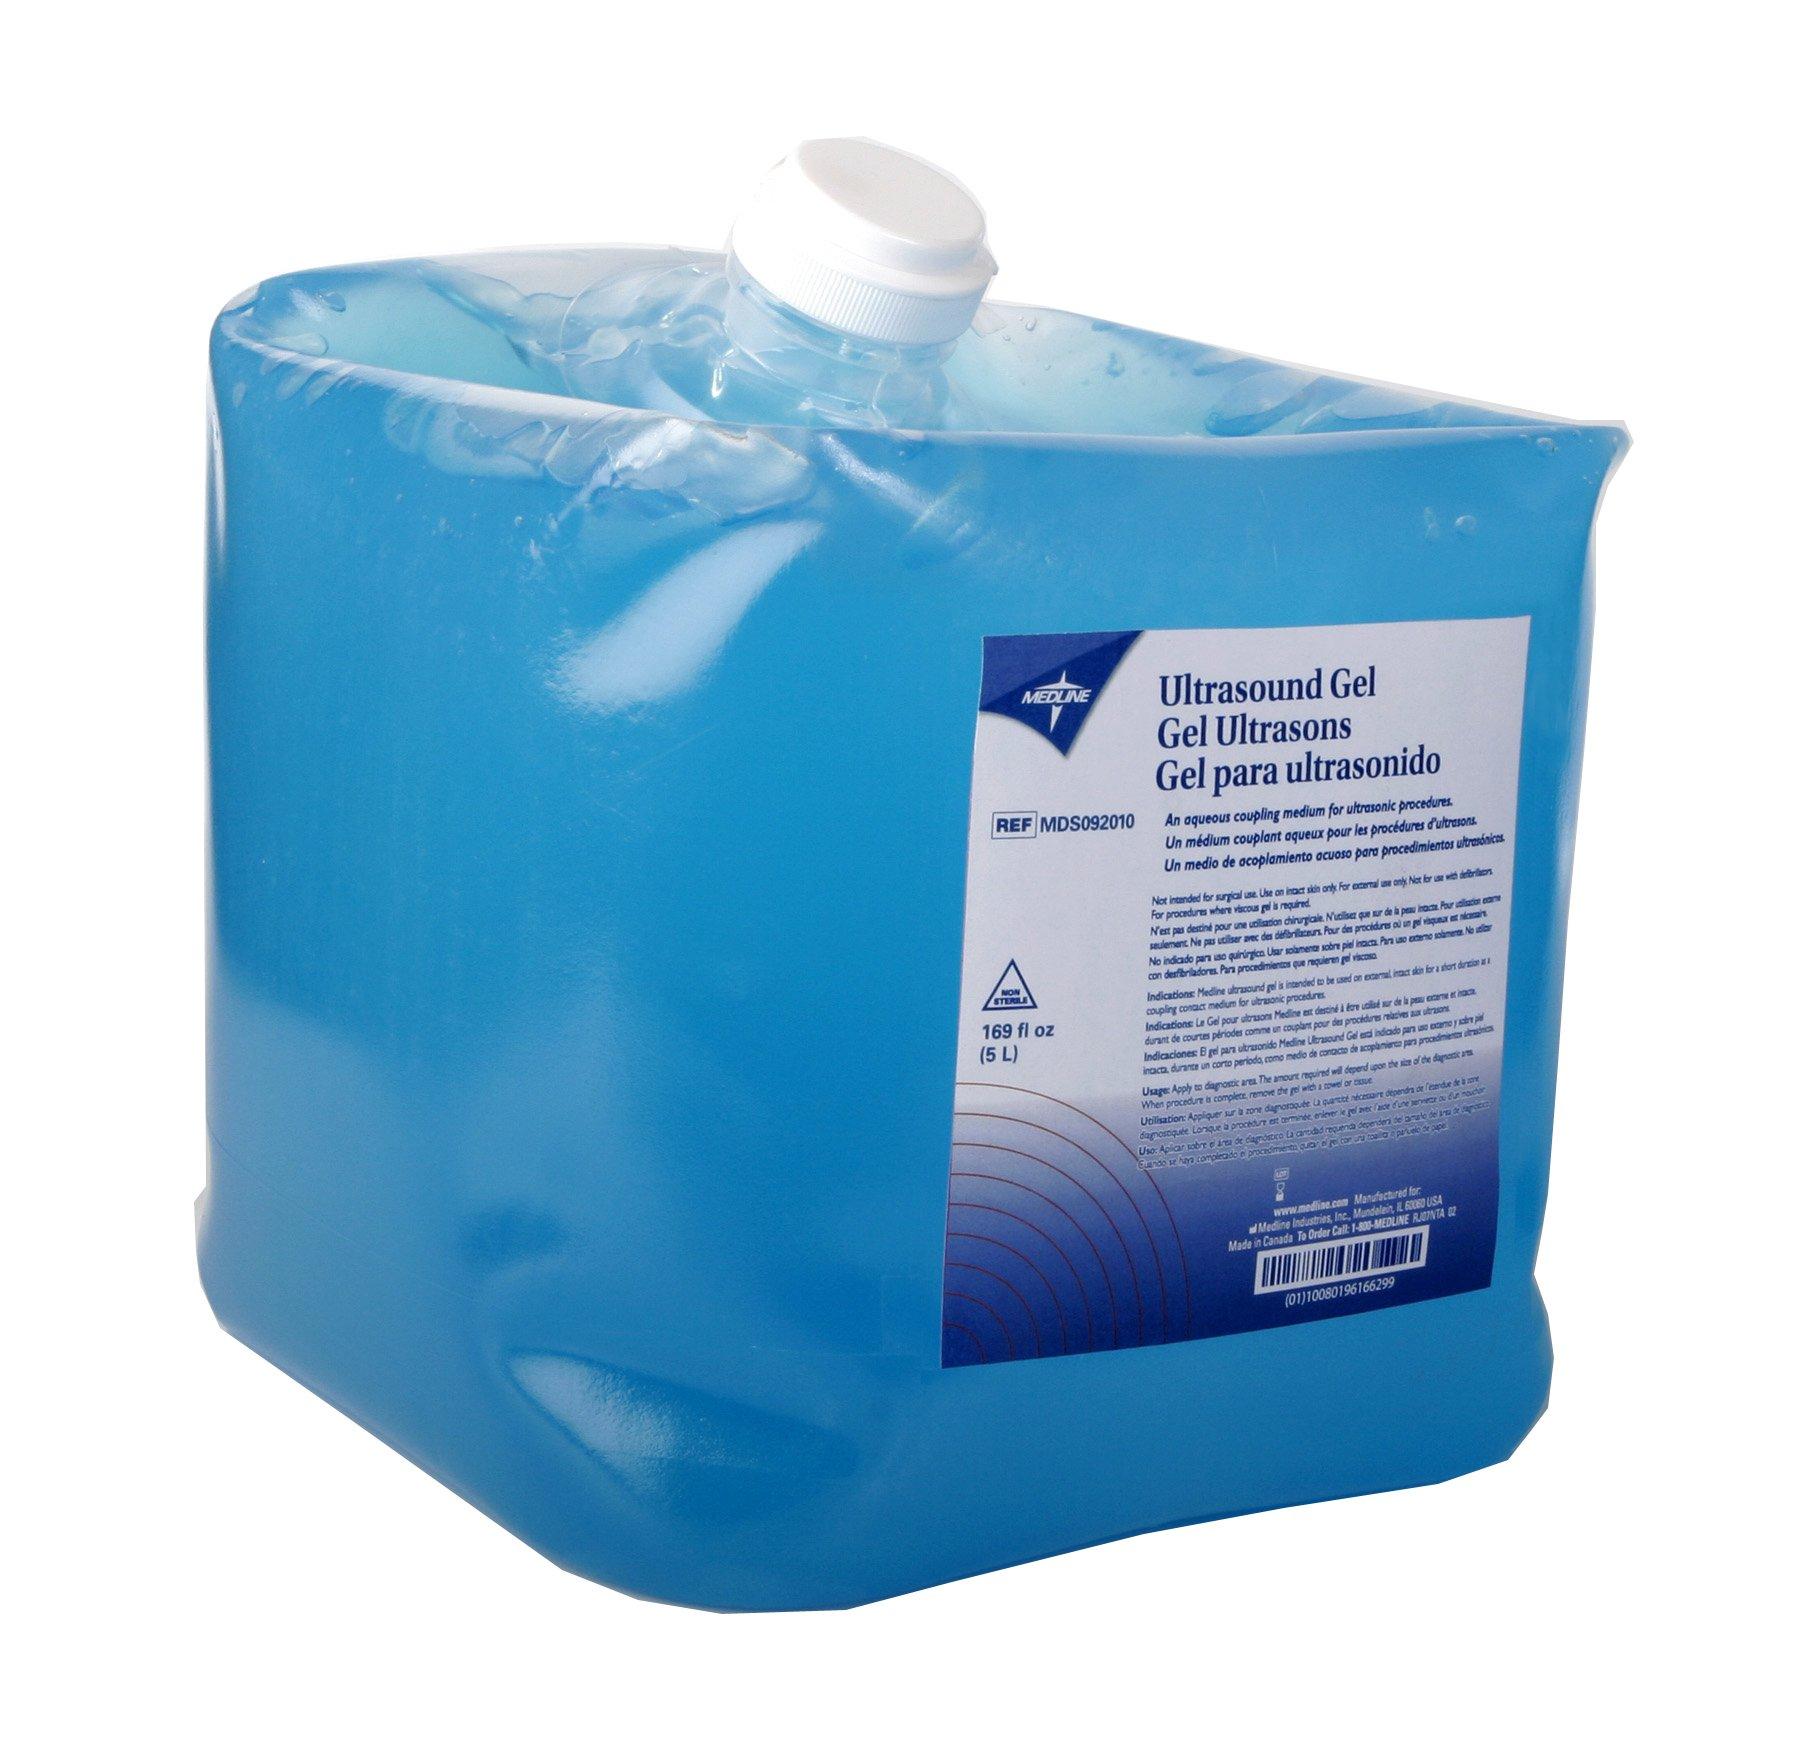 Medline MDS092010 Latex Free Blue Ultrasound Gel, 5 L Jugs, Blue (Pack of 4)